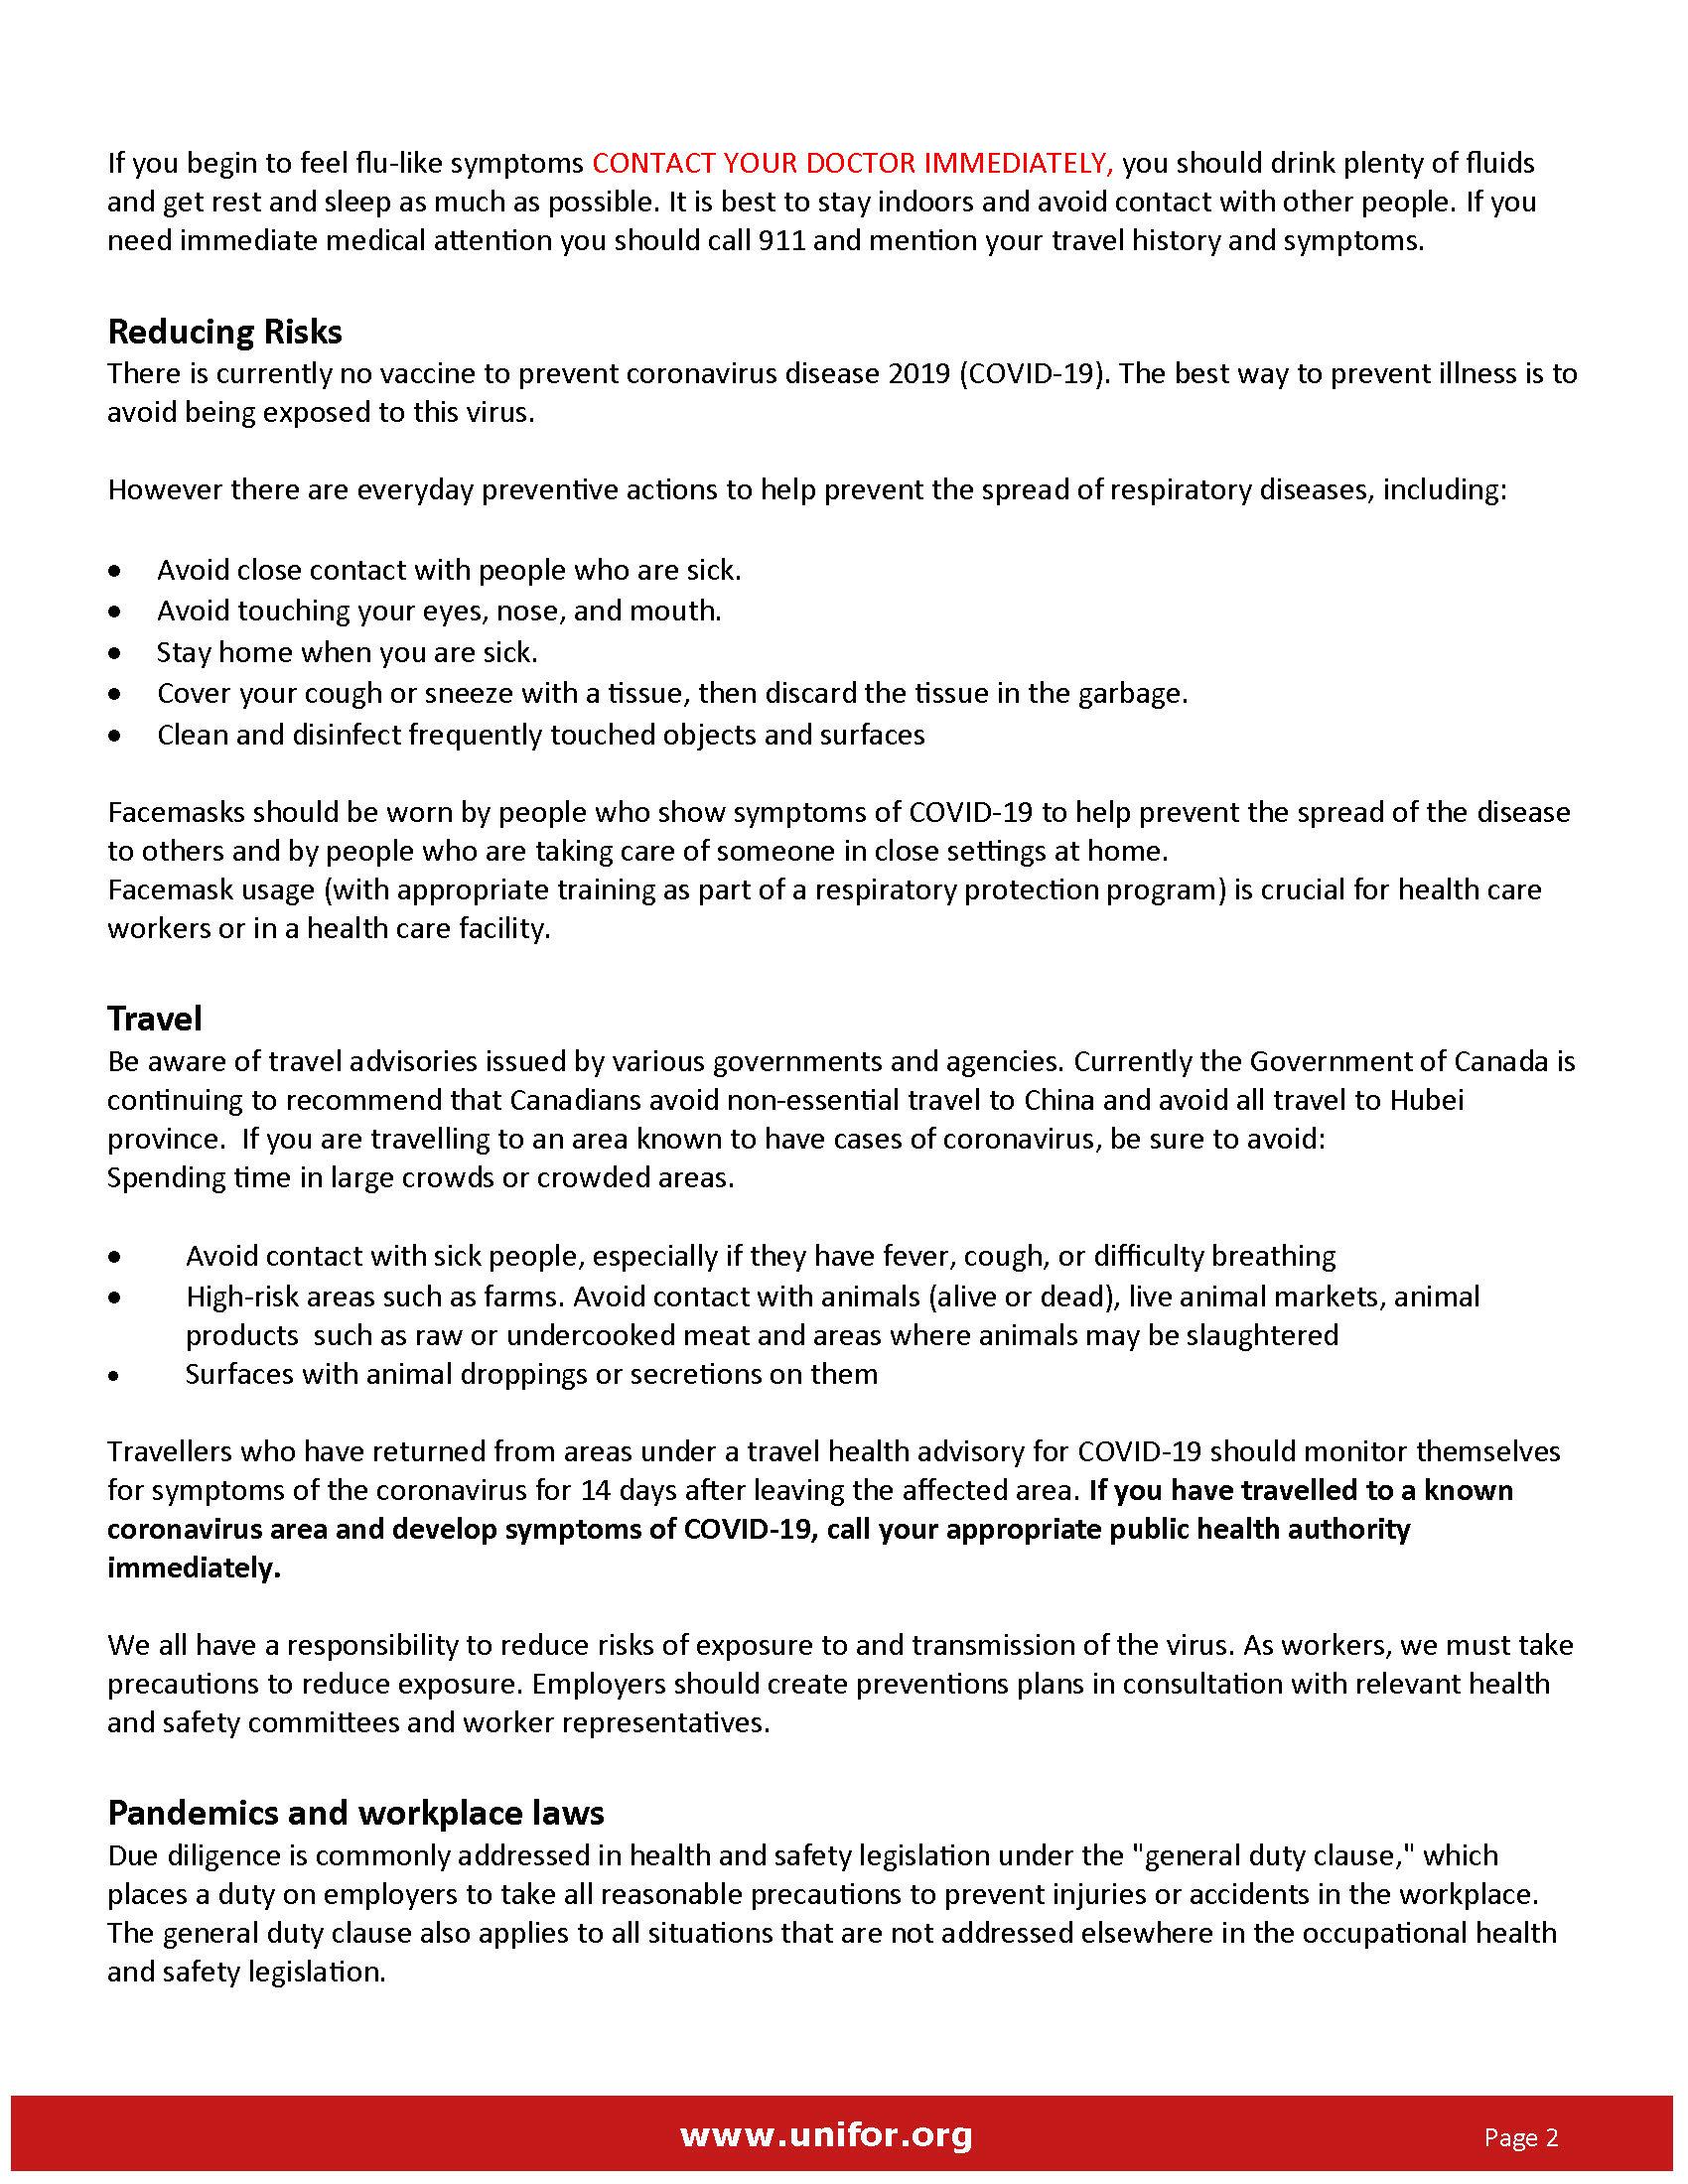 Coronavirus - Fact Sheet 2020 Mar. 13_Page_2